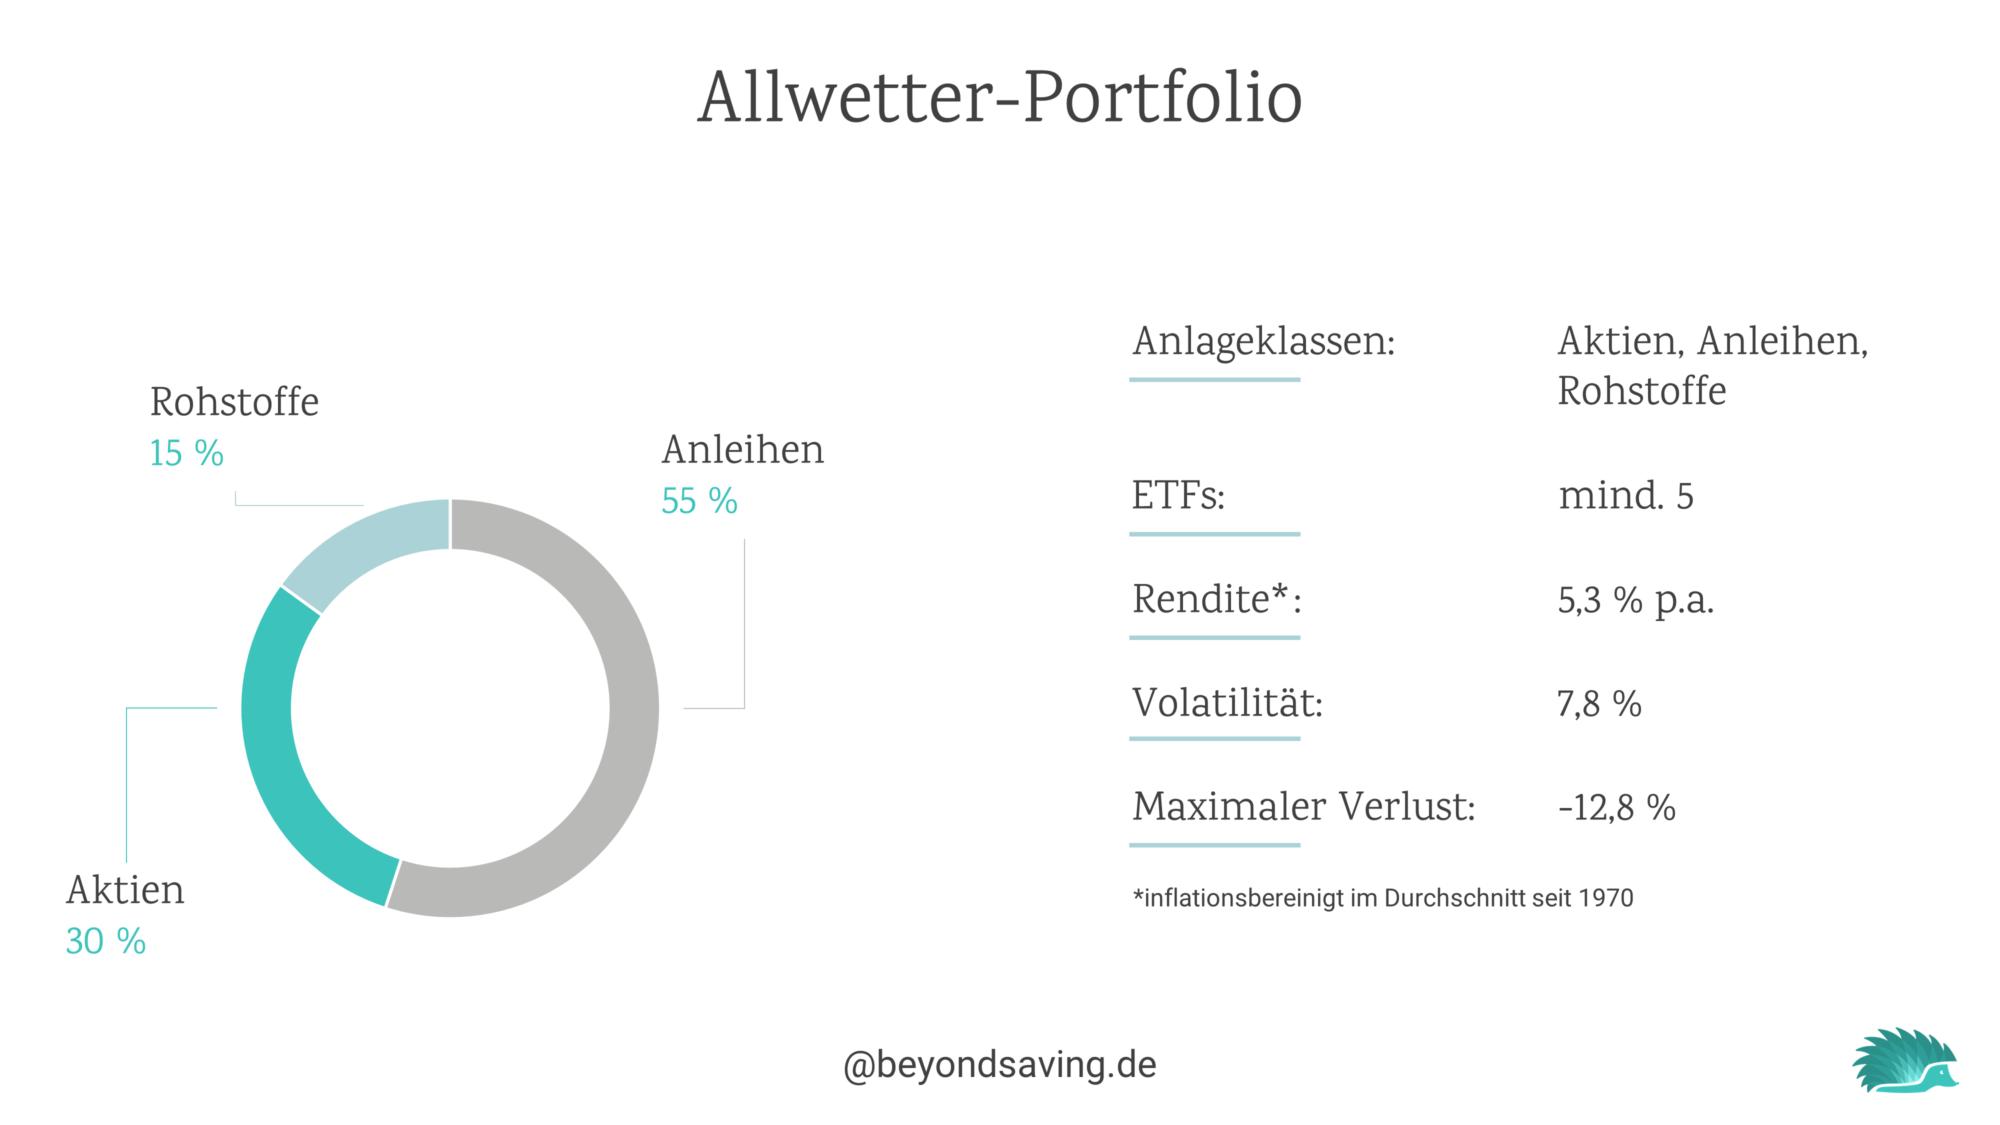 allwetter-portfolio-struktur